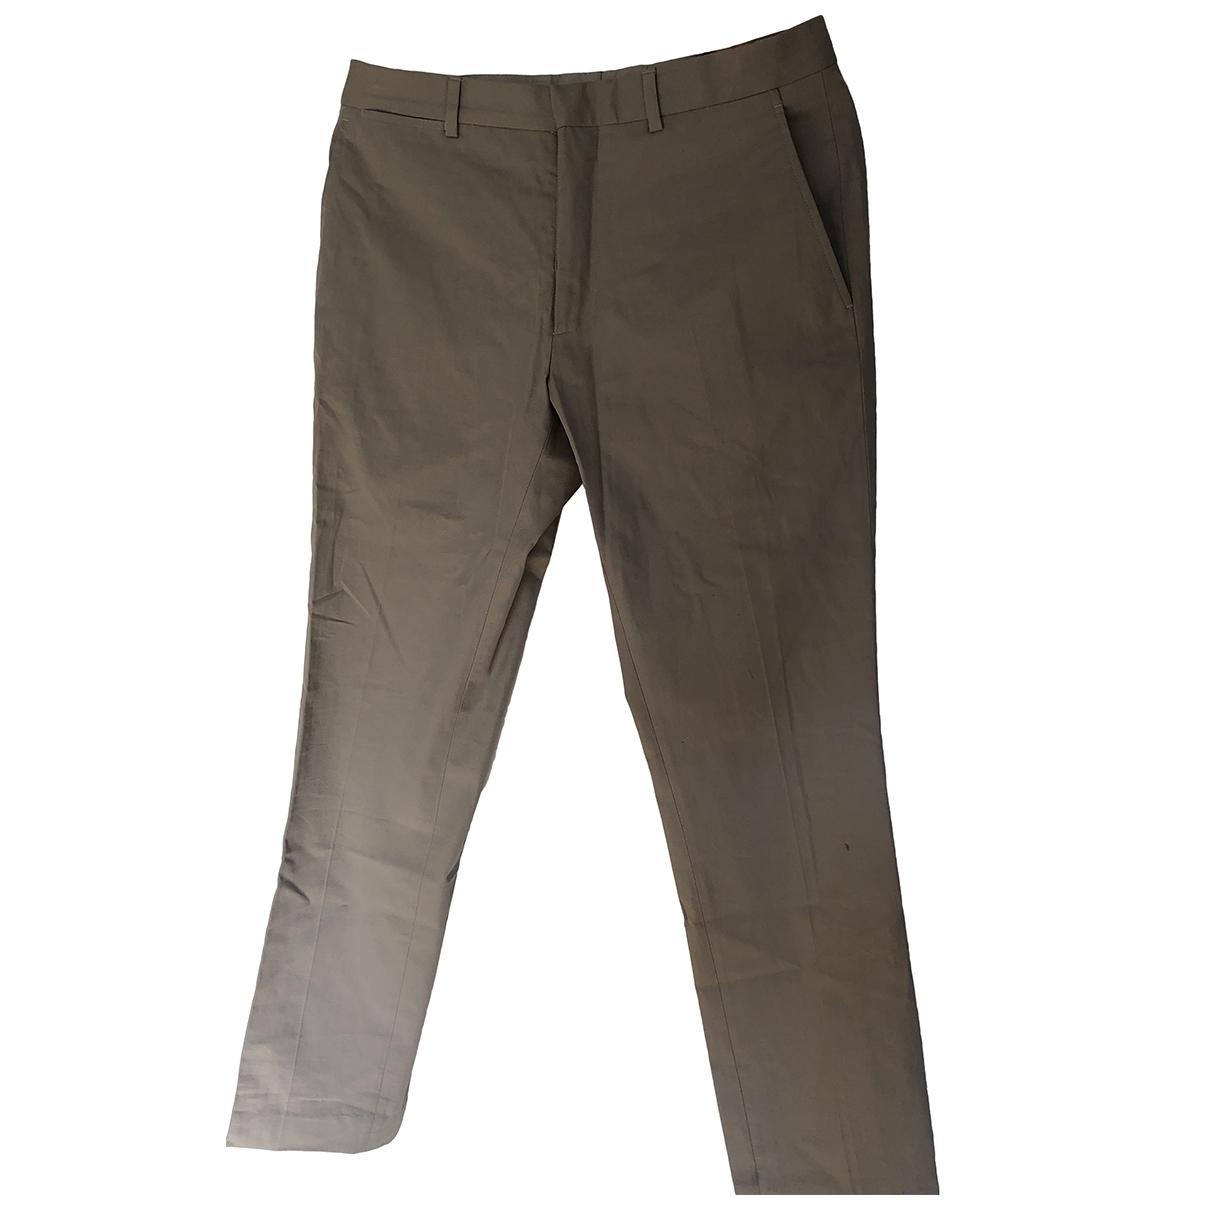 Burberry \N Beige Cotton Trousers for Men M International